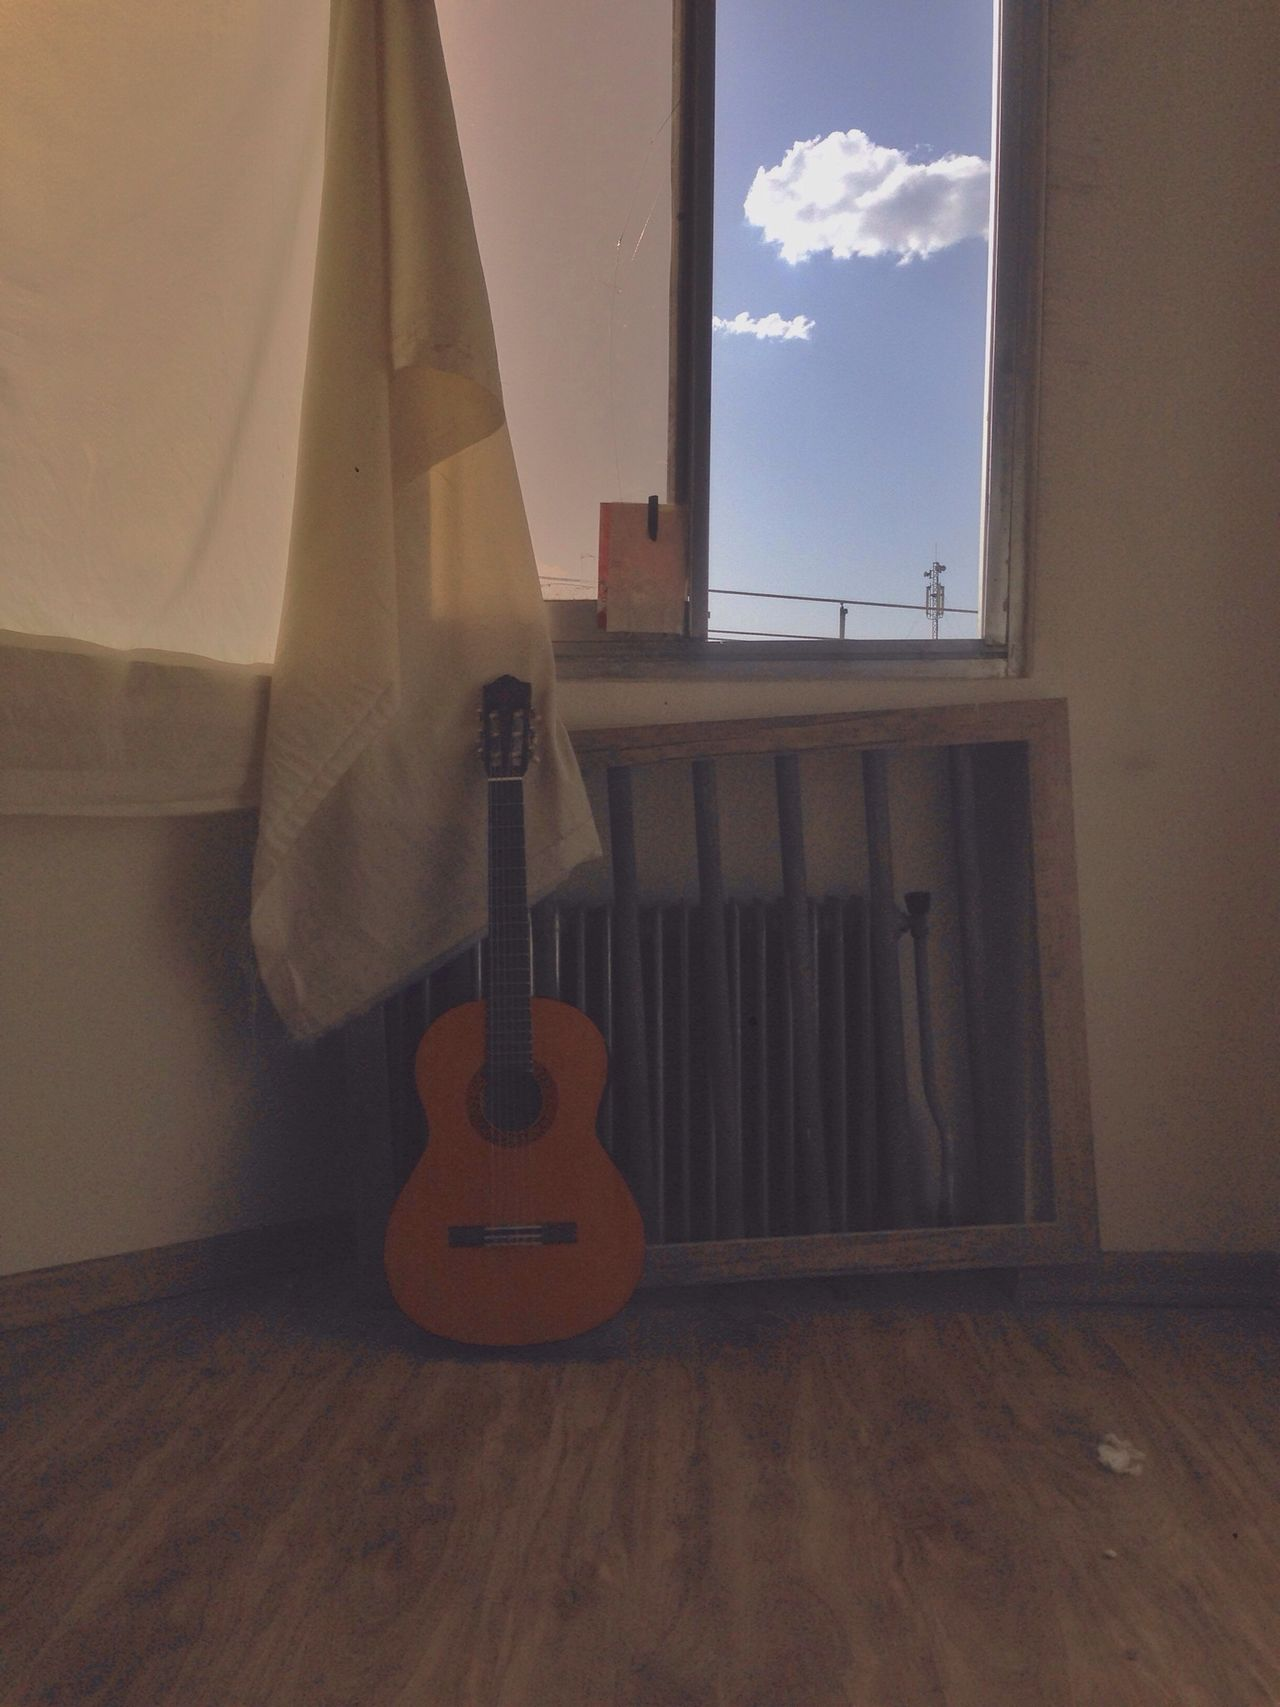 Beautiful stock photos of guitar, Architecture, Built Structure, Cloud, Curtain